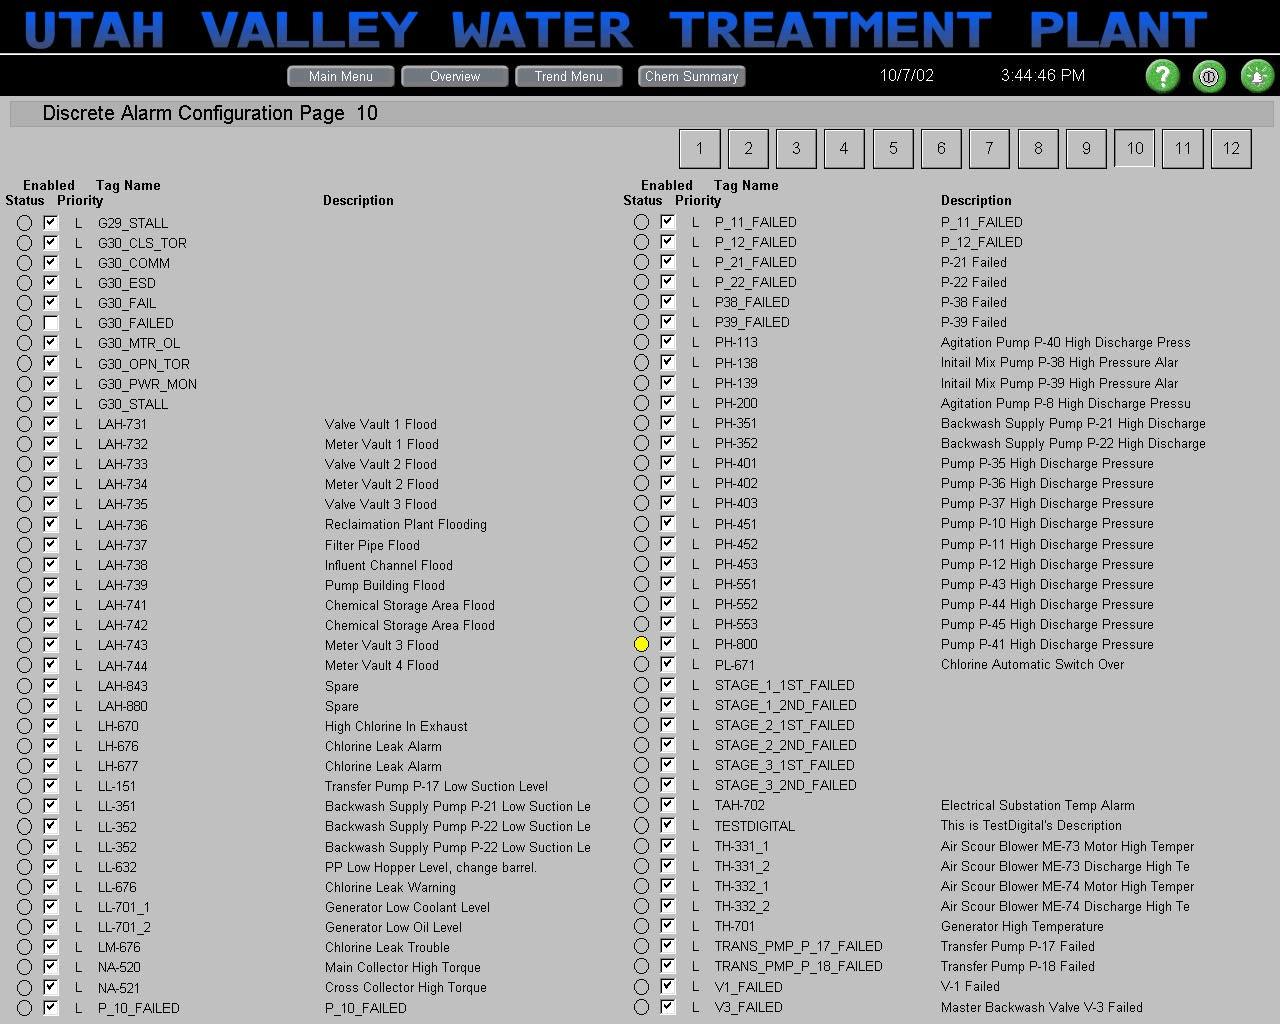 Utah Valley Water Treatment Plant